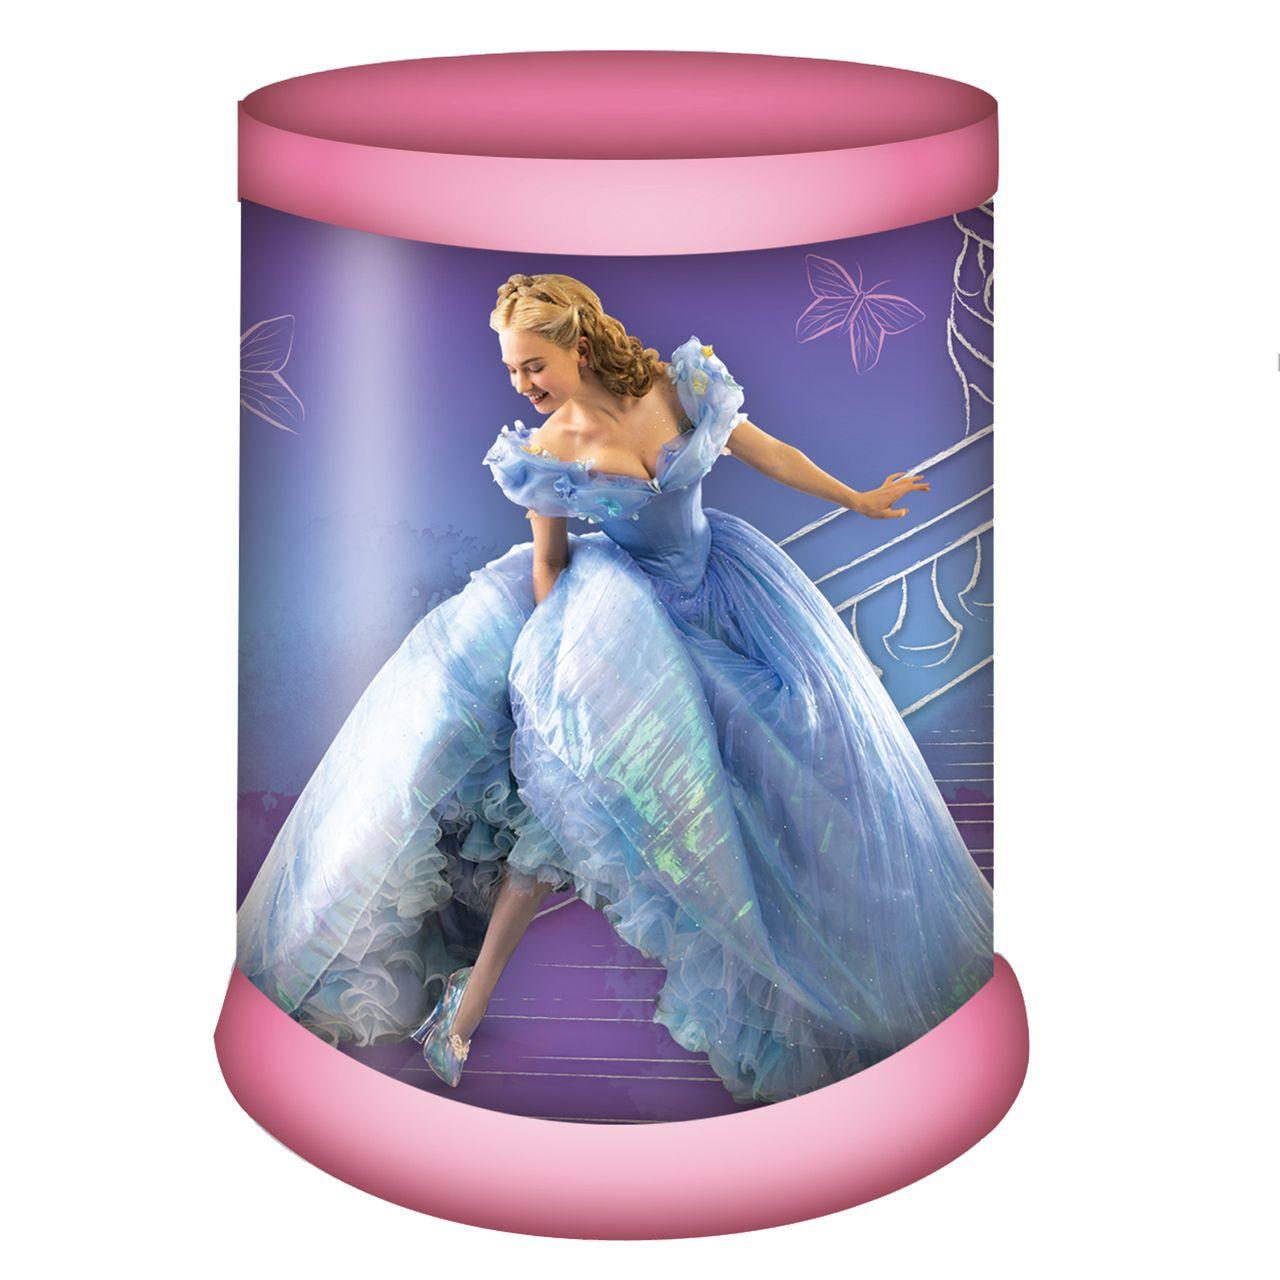 Сборный стакан для канцелярских принадлежностей Disney ЗолушкаПеналы<br>Сборный стакан для канцелярских принадлежностей Disney Золушка<br>